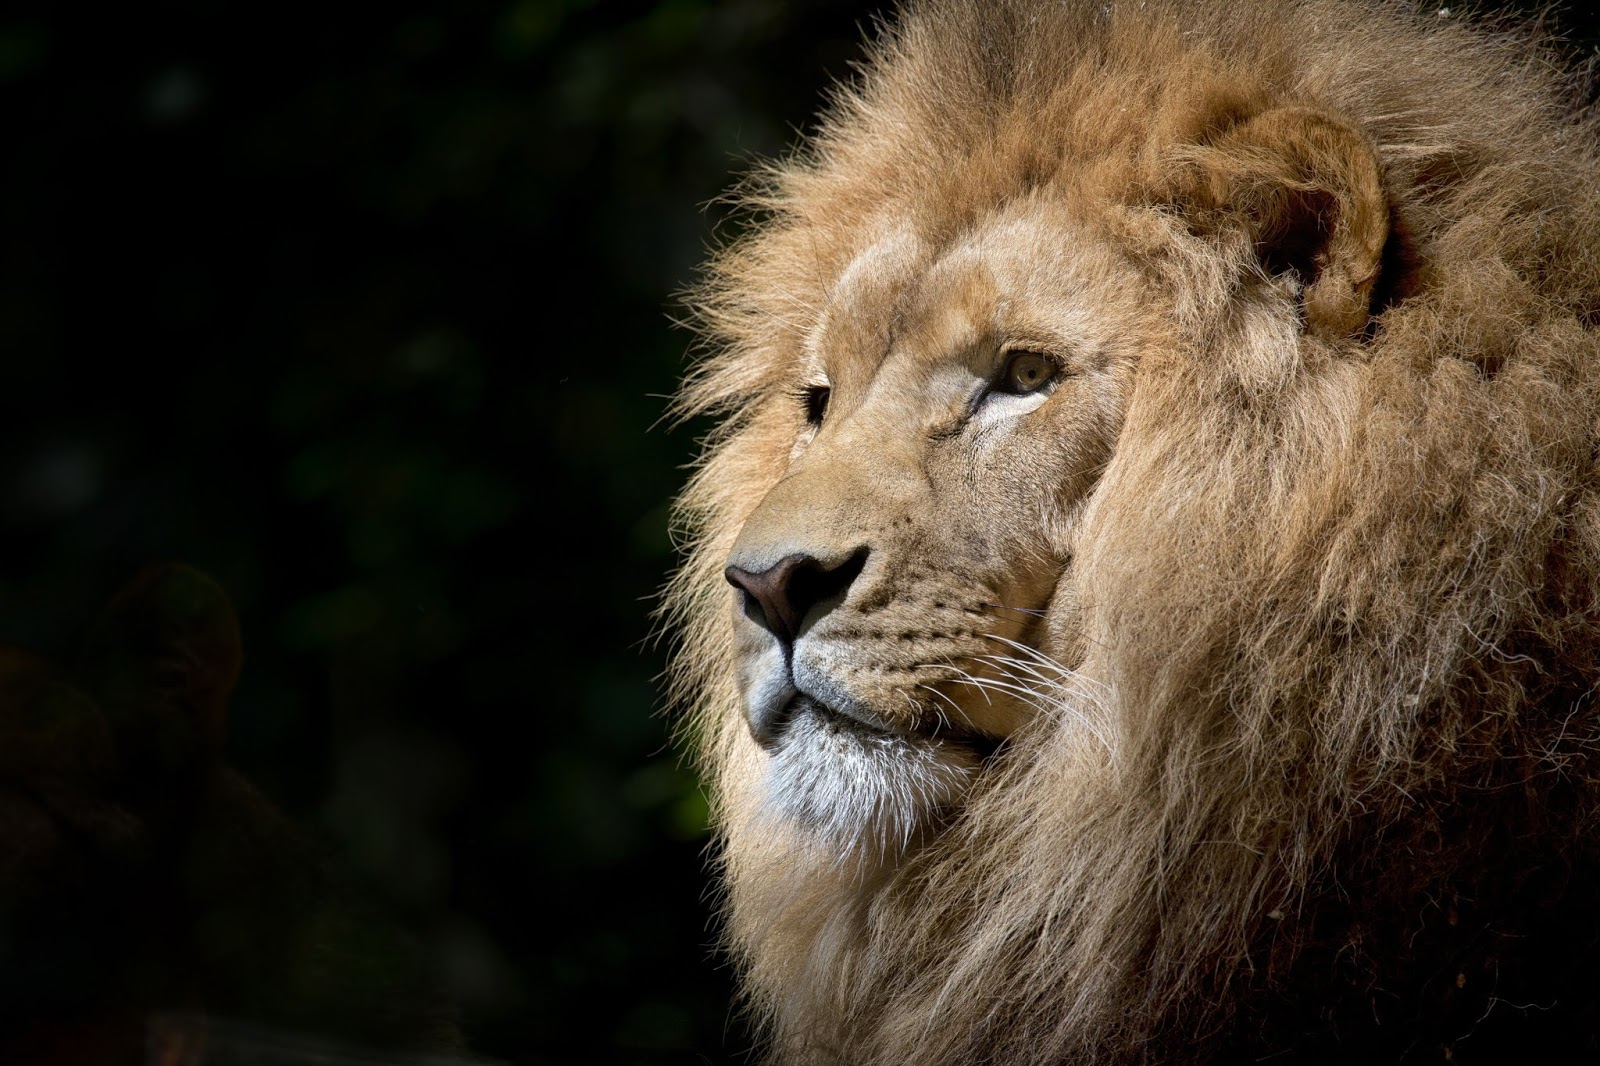 Lion Wild Africa,lion images